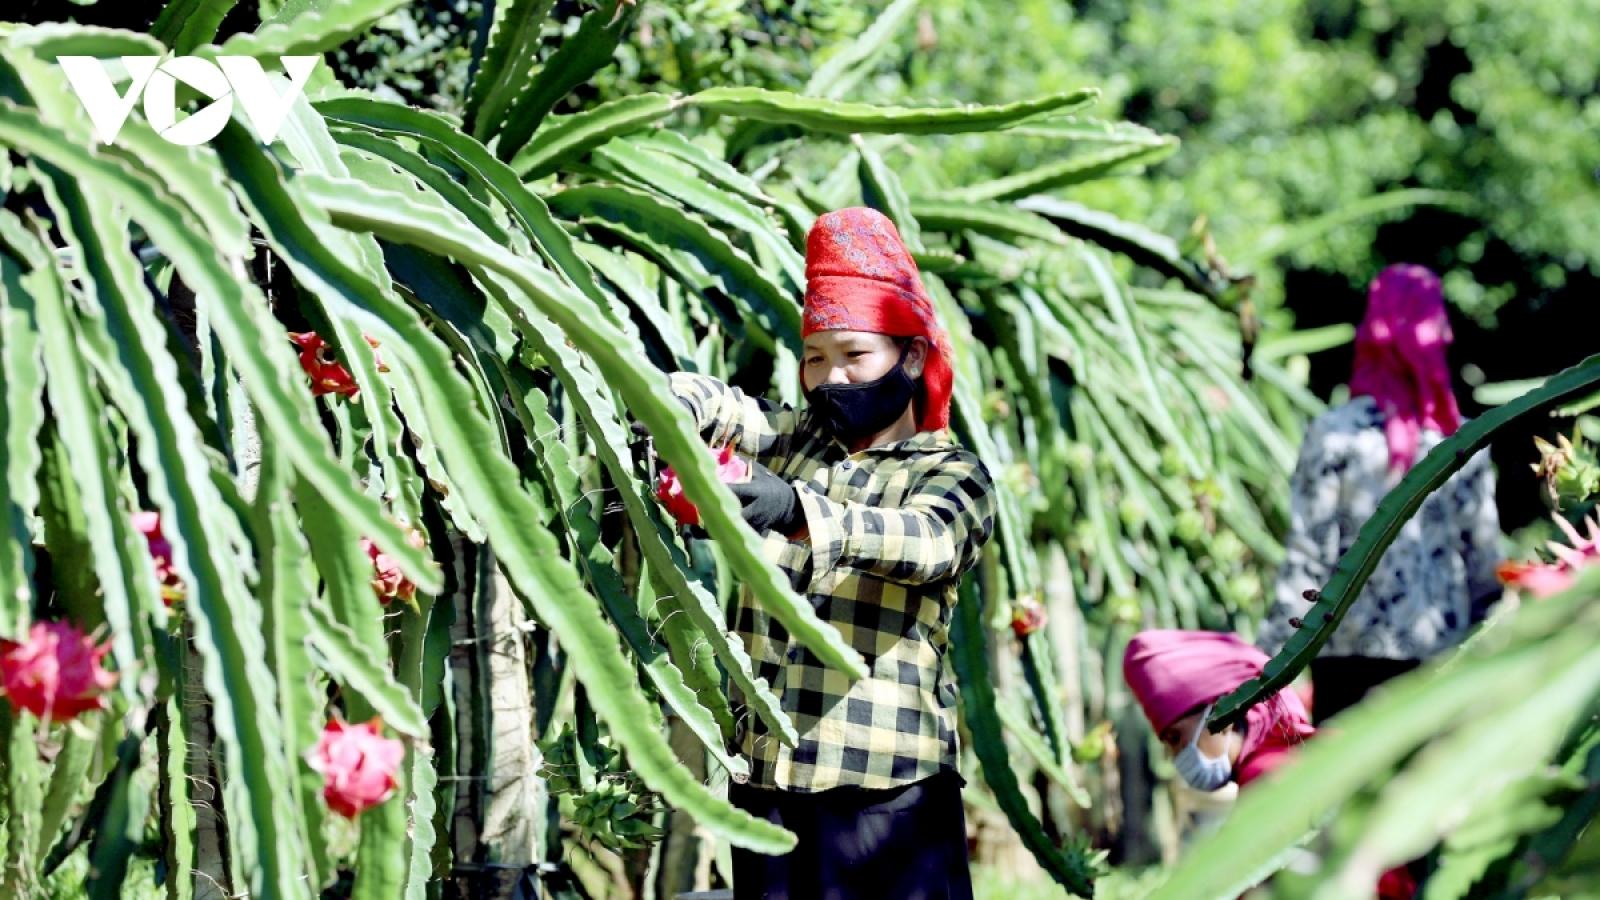 Vietnamese dragon fruit enjoys advantages in international market